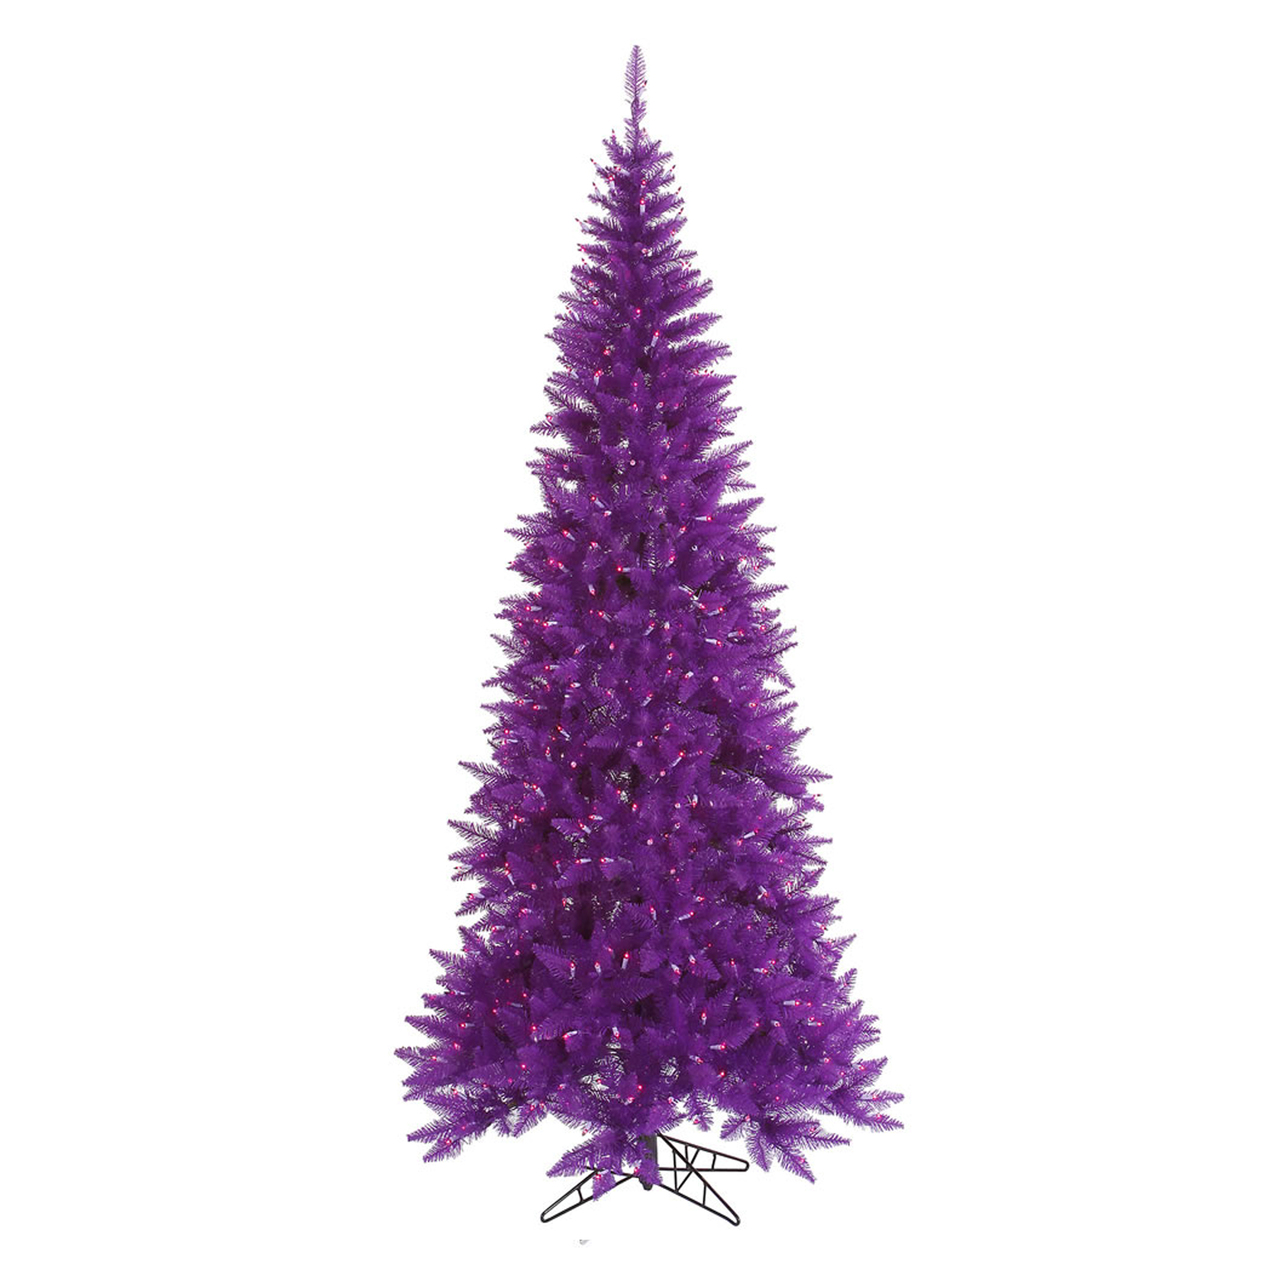 10' Pre-Lit Slim Purple Ashley Spruce Christmas Tree